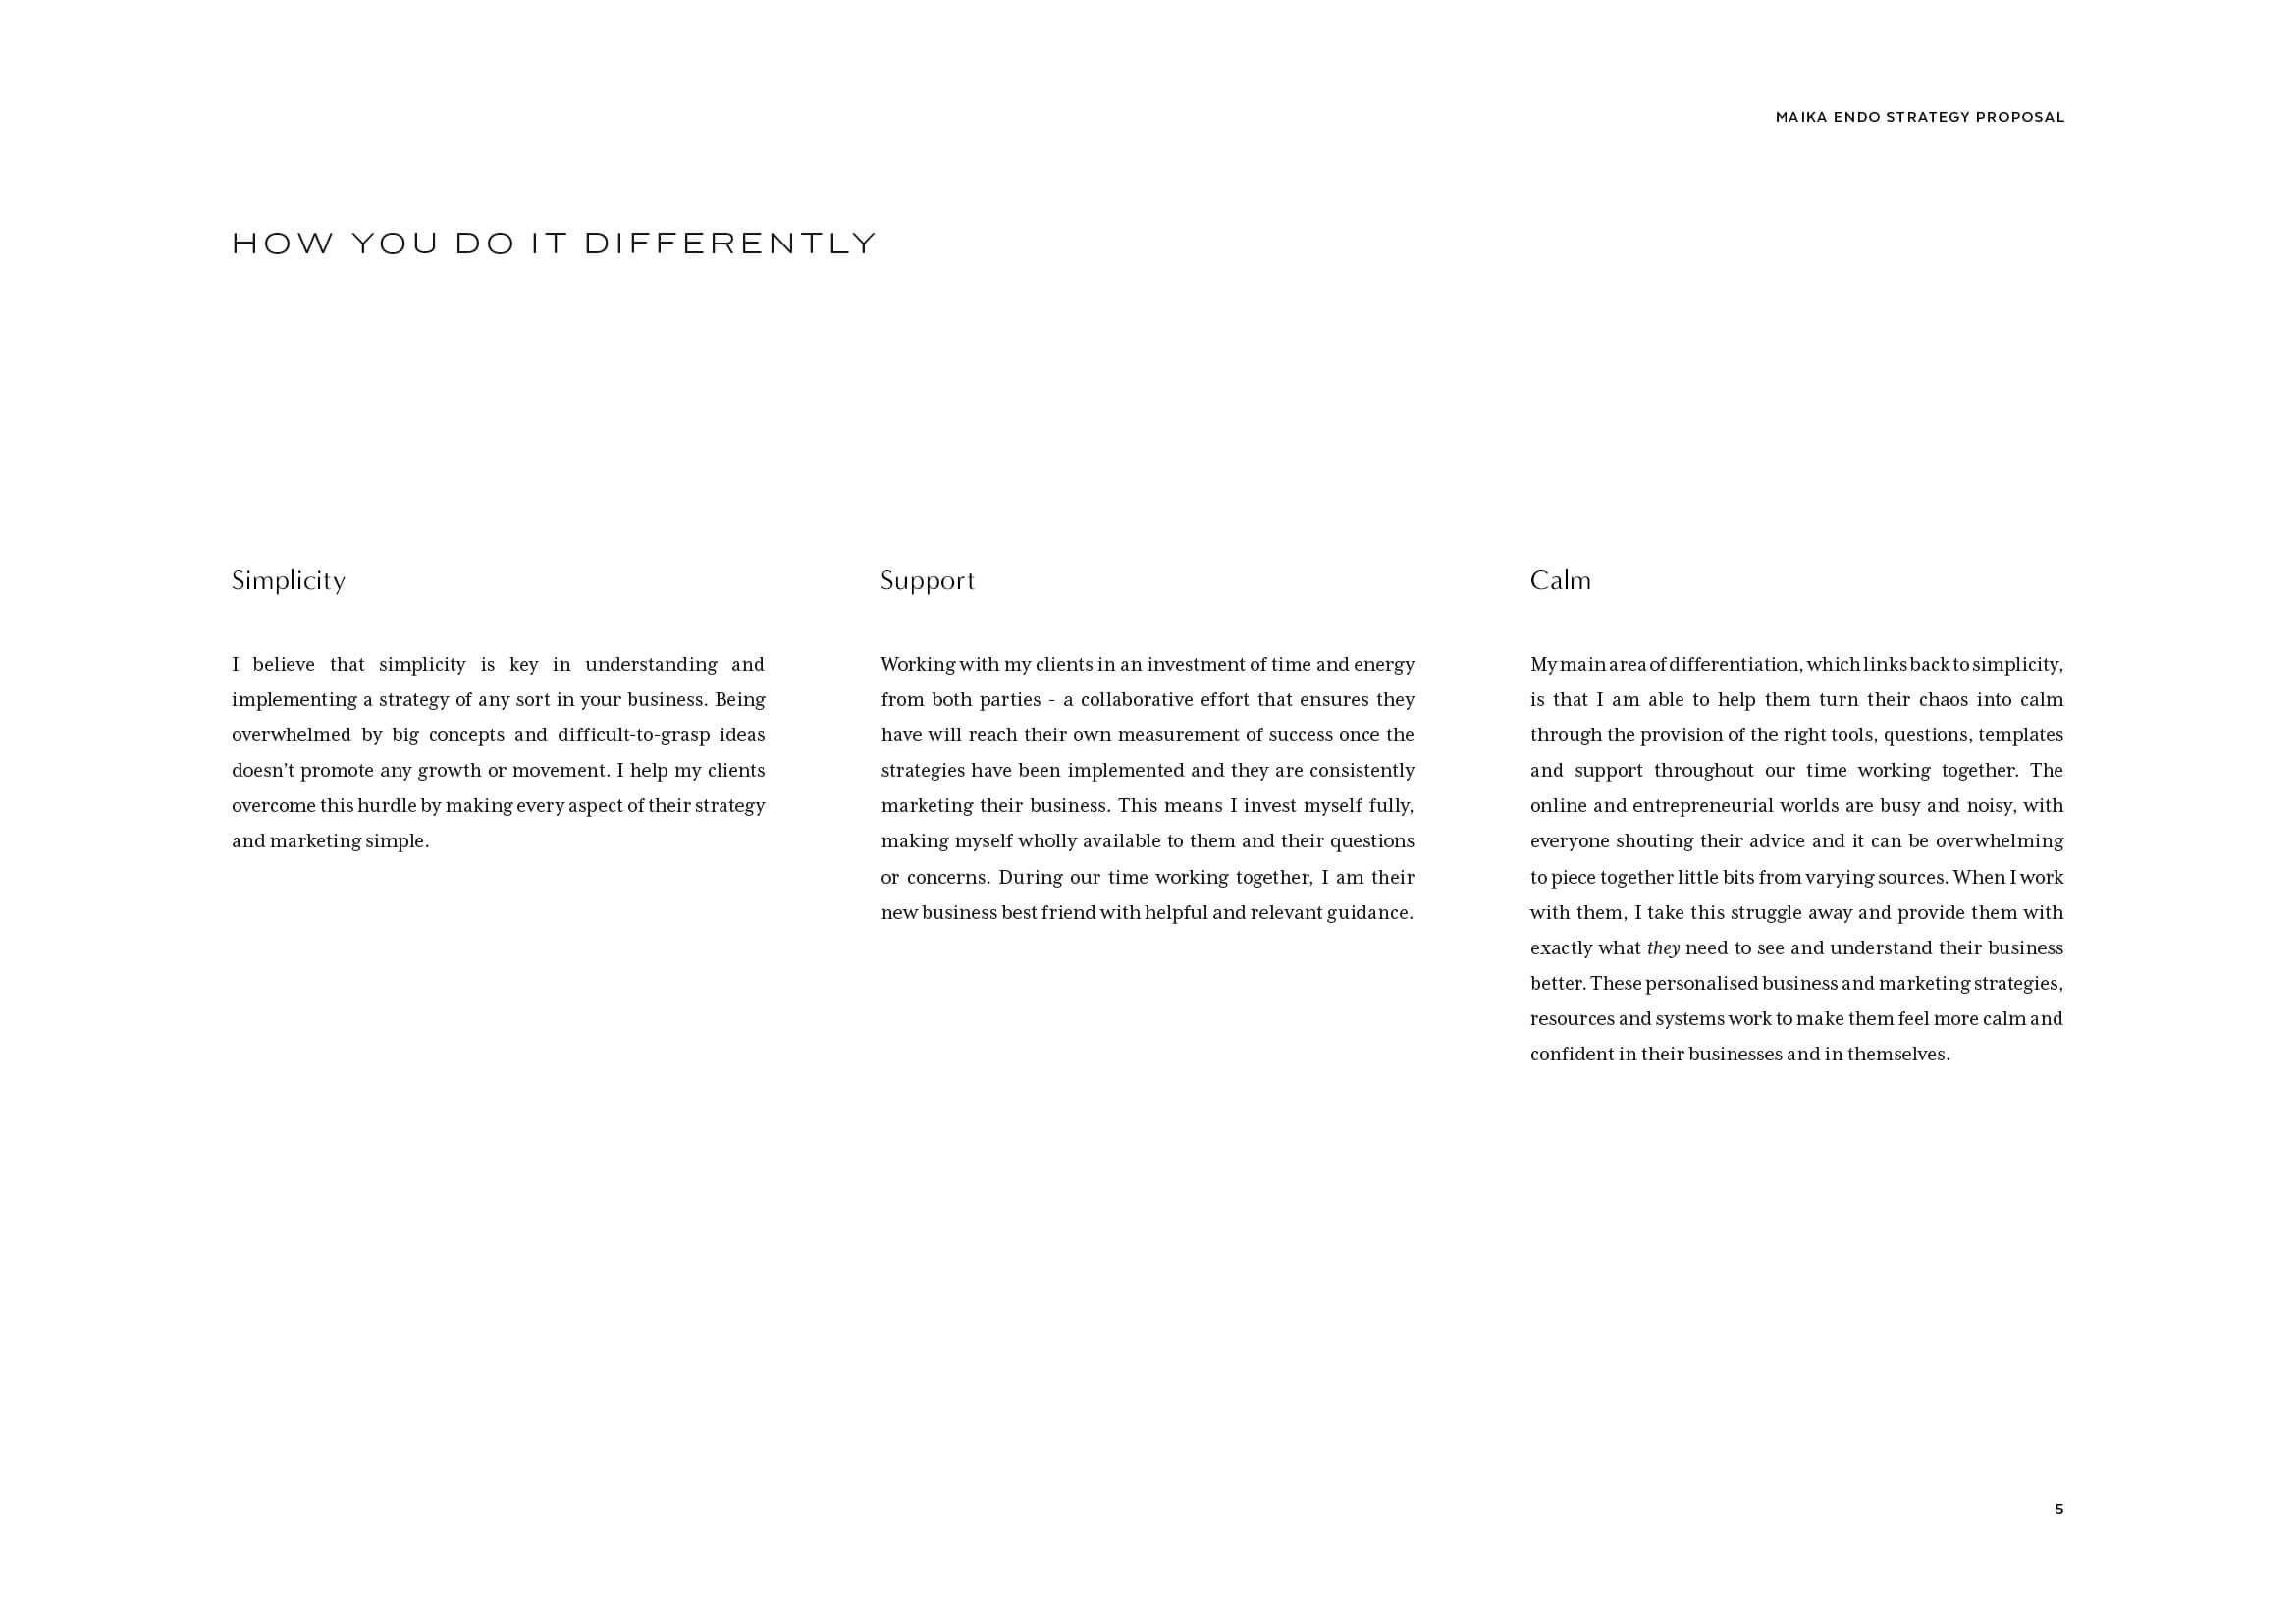 Maika Endo Strategy Proposal5.jpg